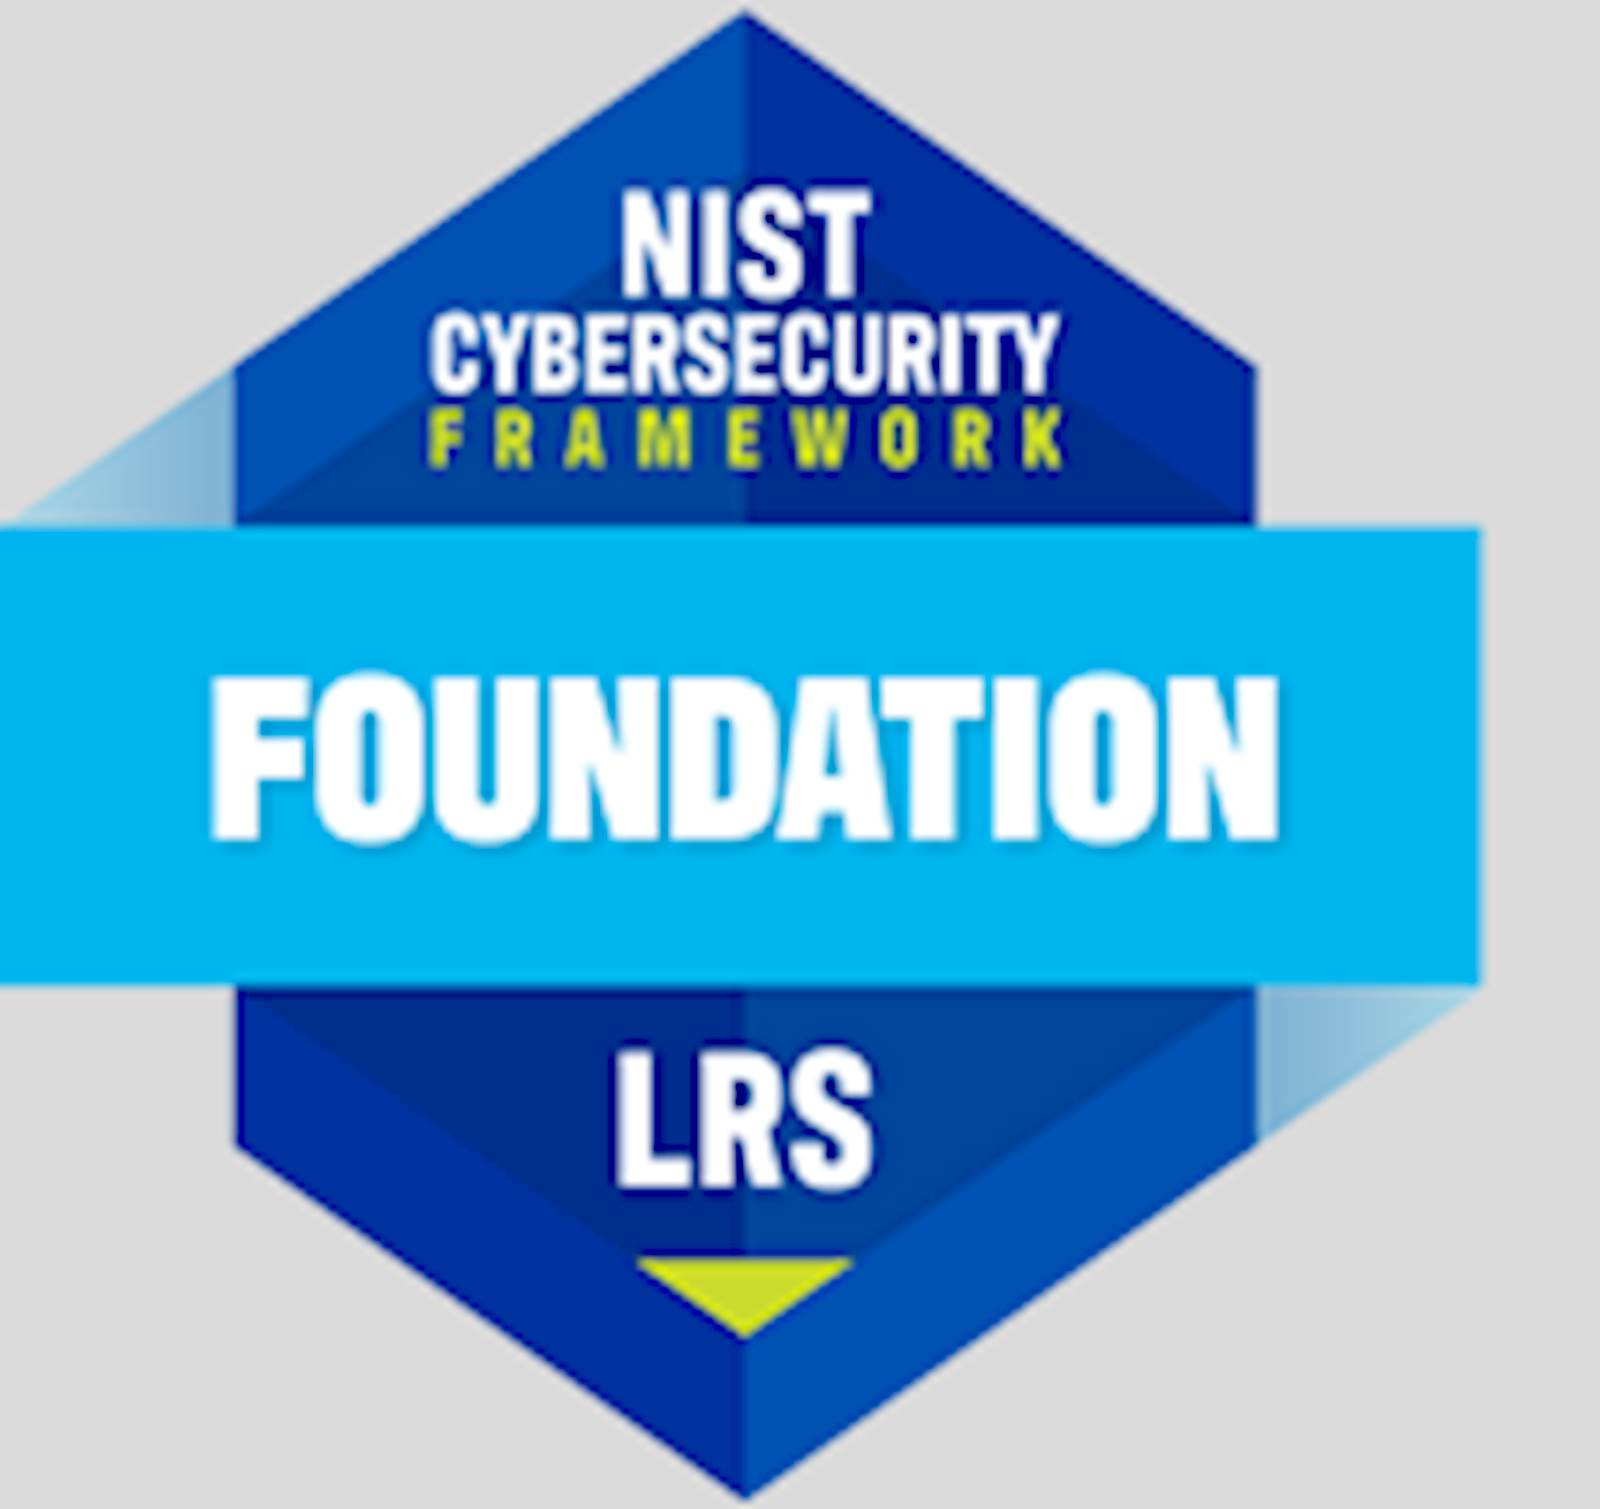 NIST Cyber security Framework Foundation Course Details